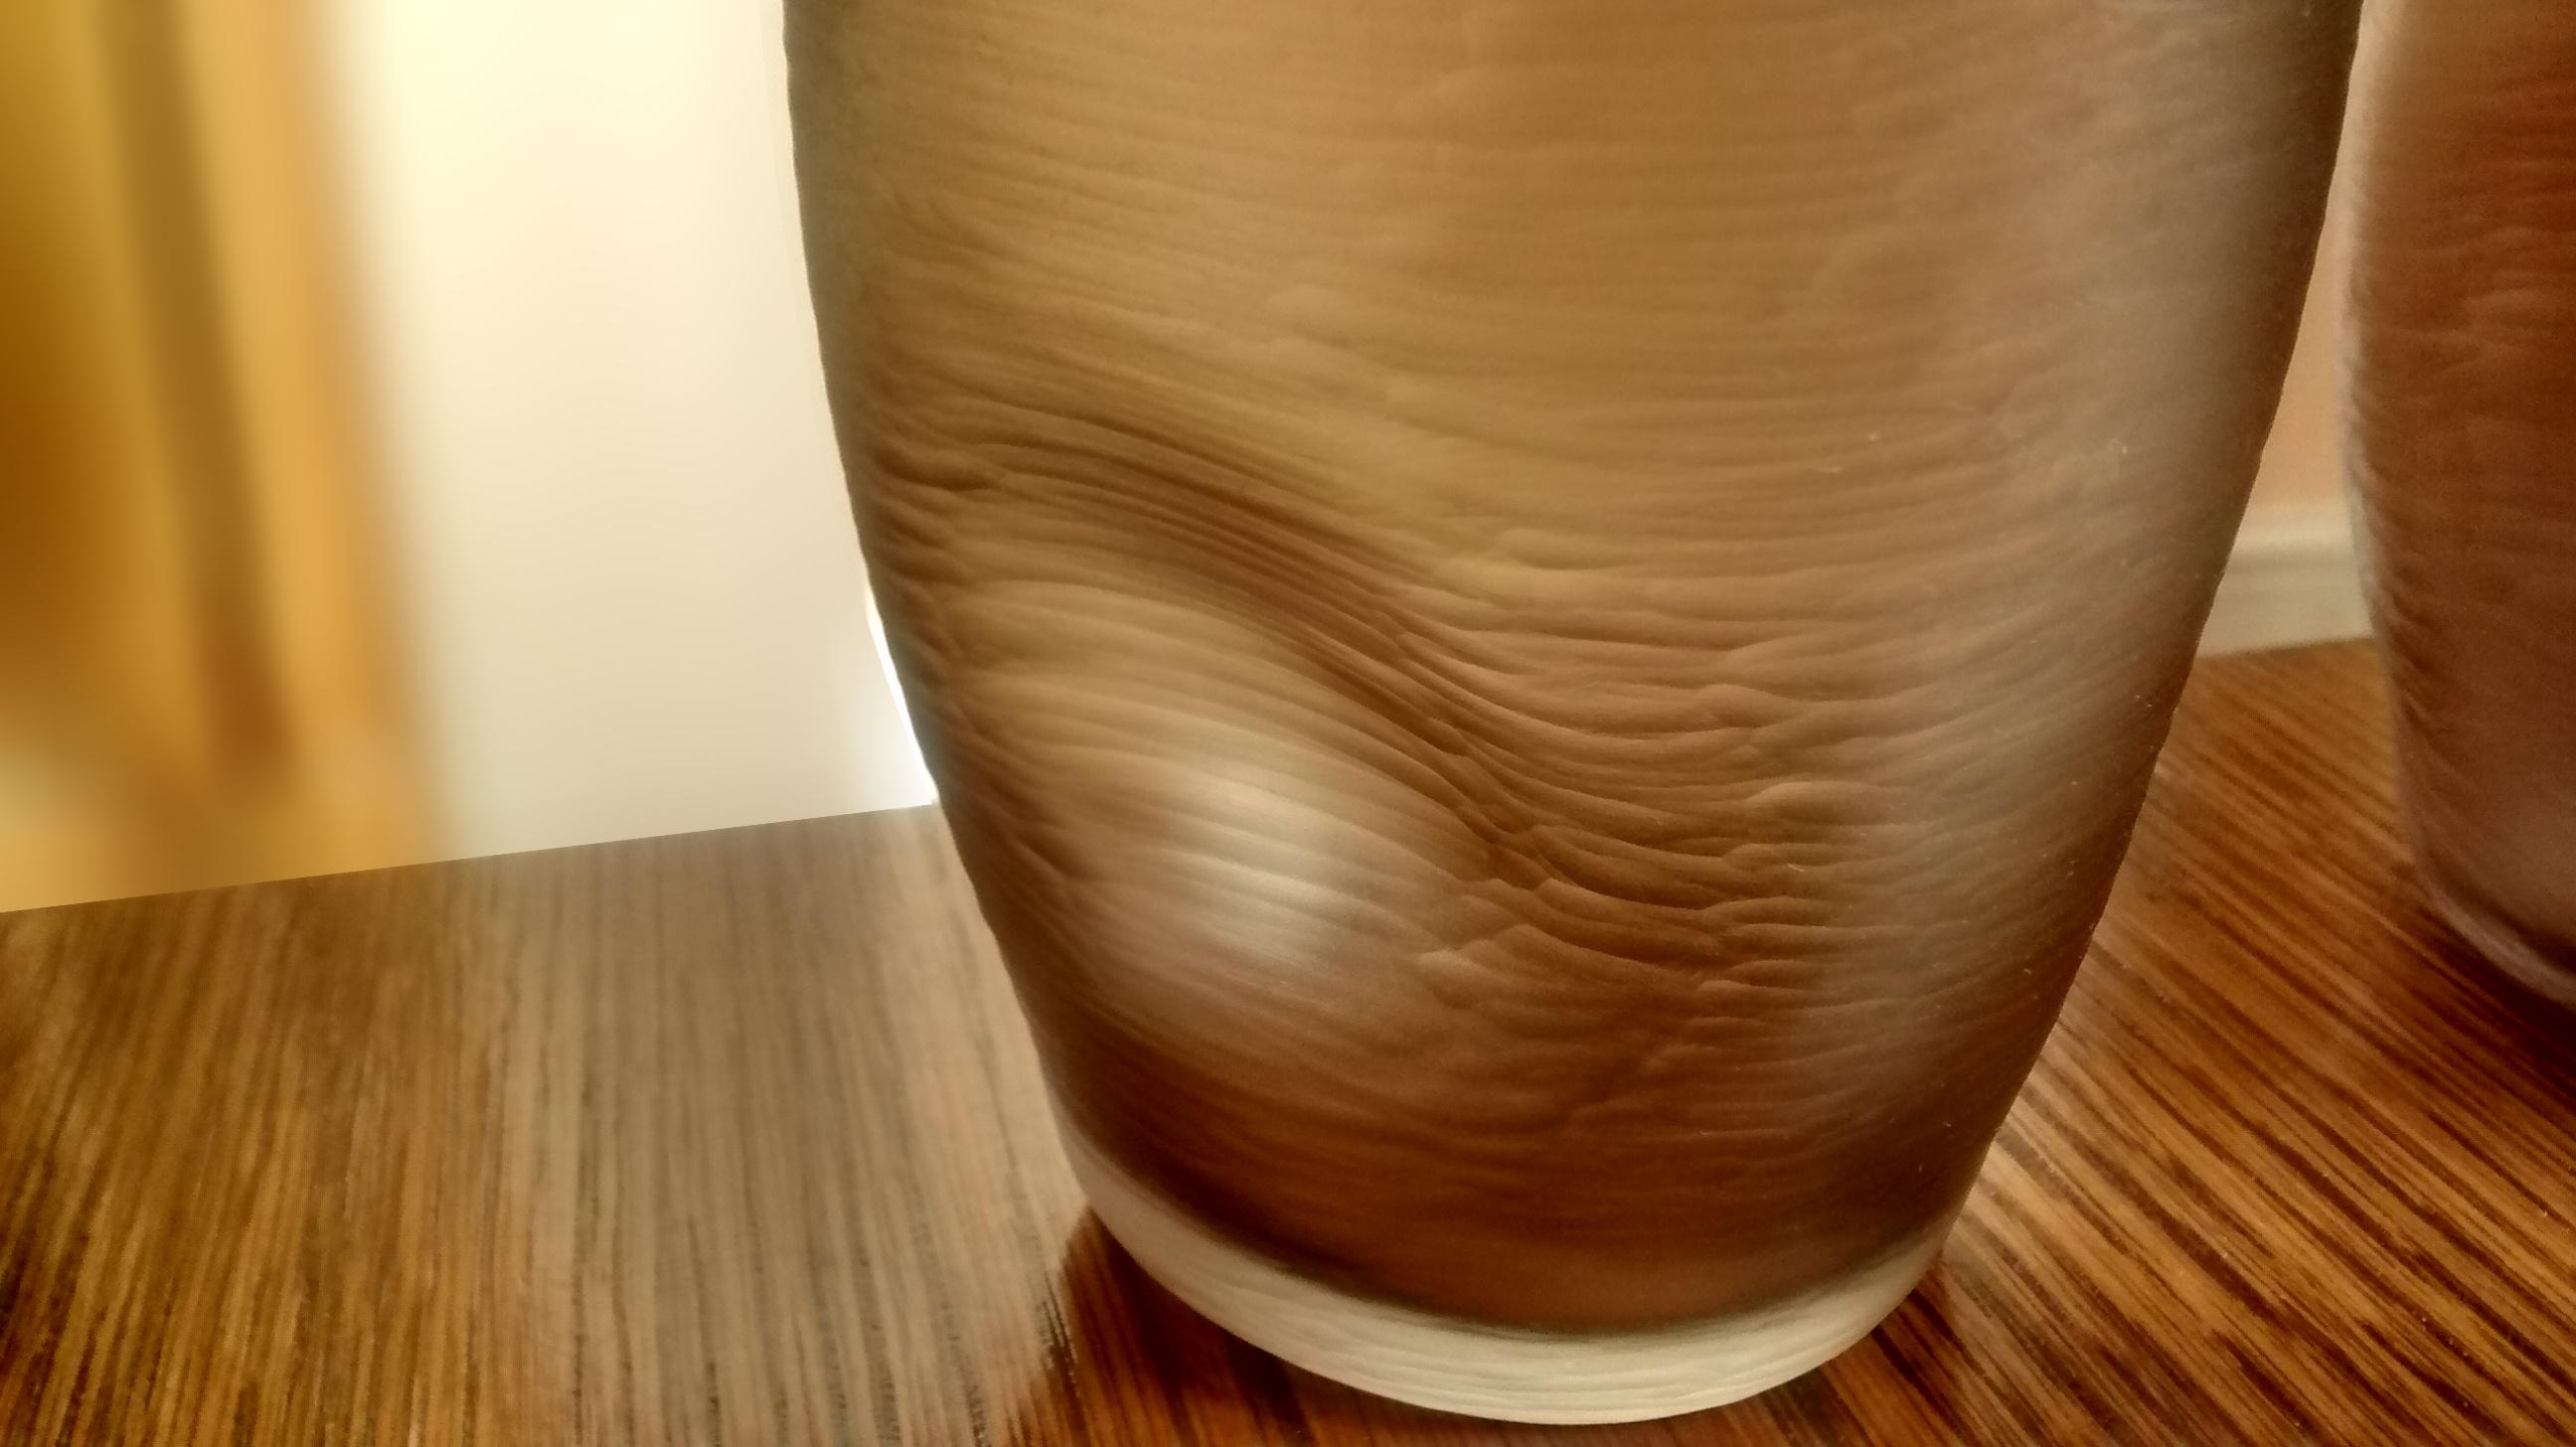 Ergonomic cut glass tumbler